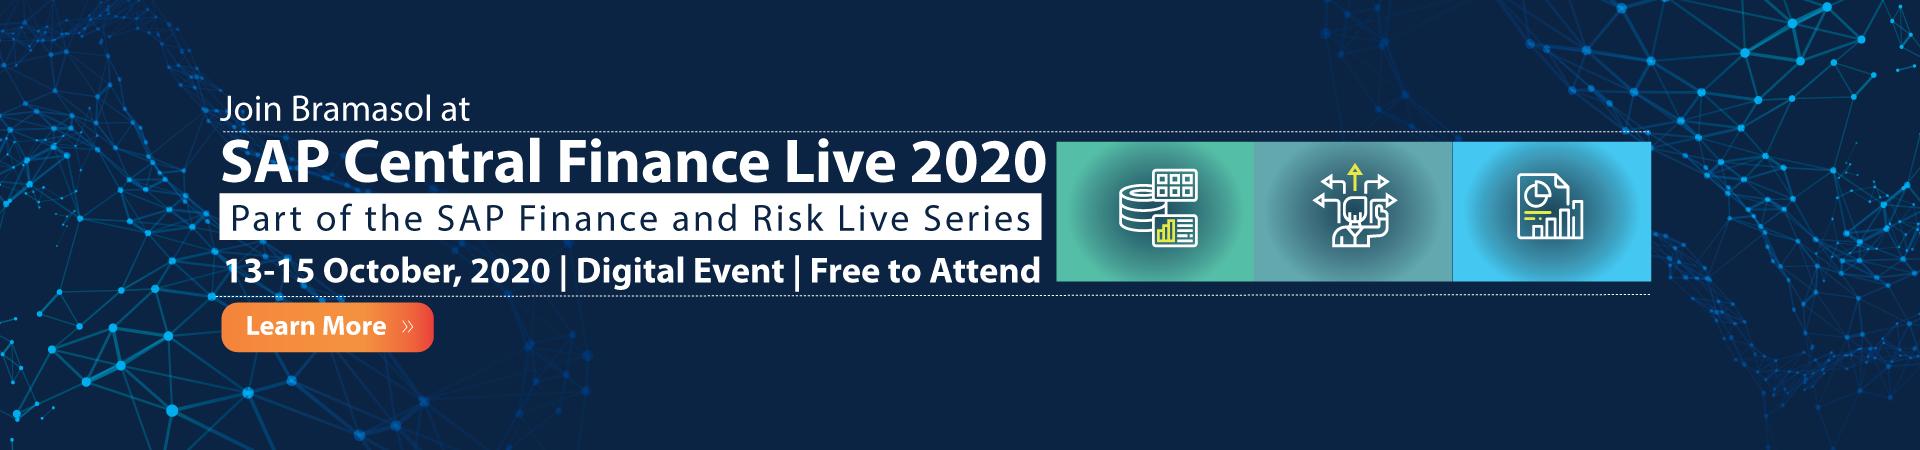 SAP Central Finance Live event